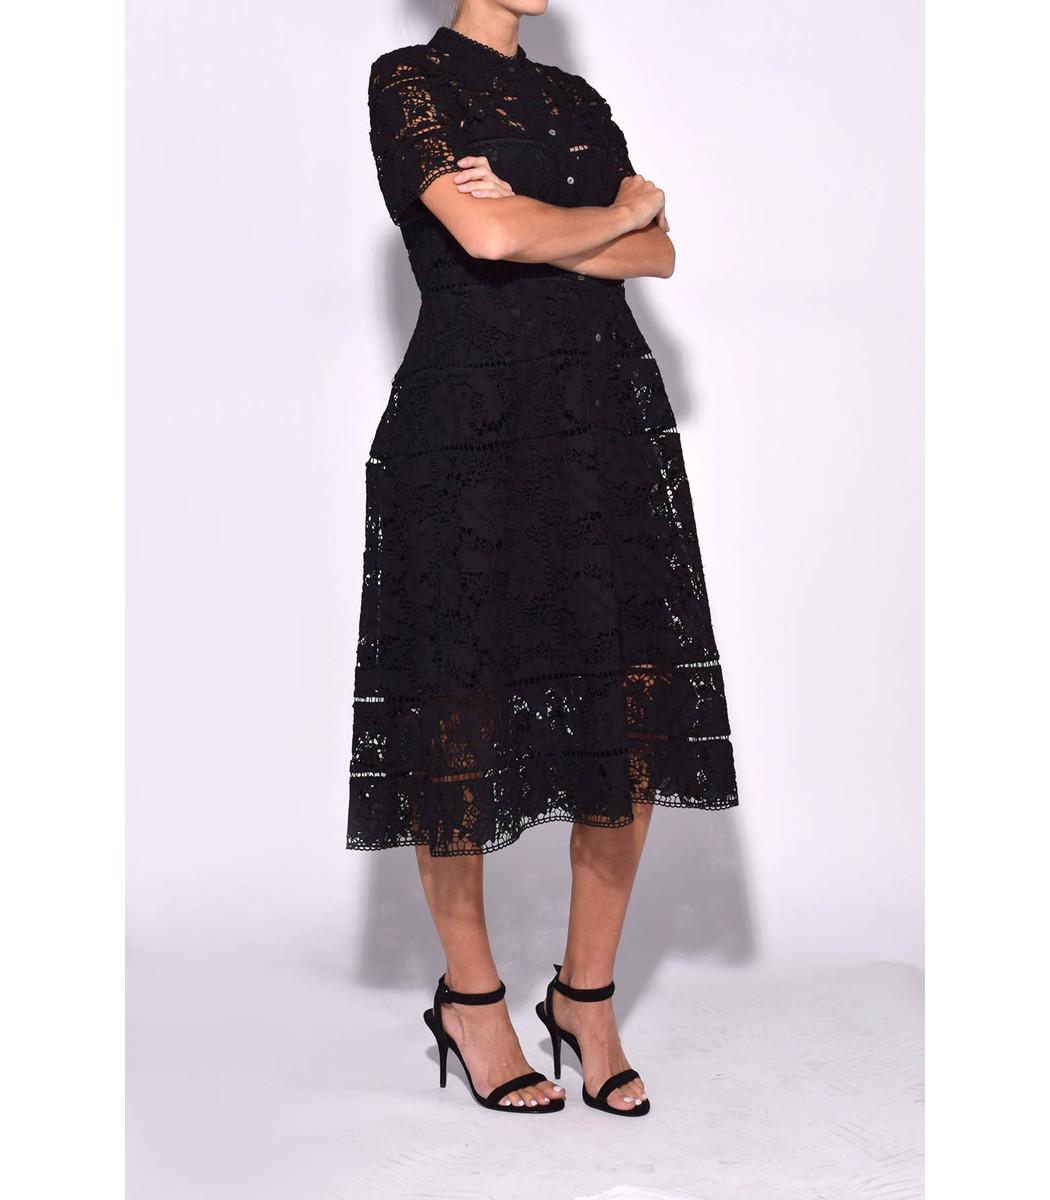 23353a1f4e2 Zimmermann Black 'gossamer' Bell Lace Shirt Dress in Black - Lyst